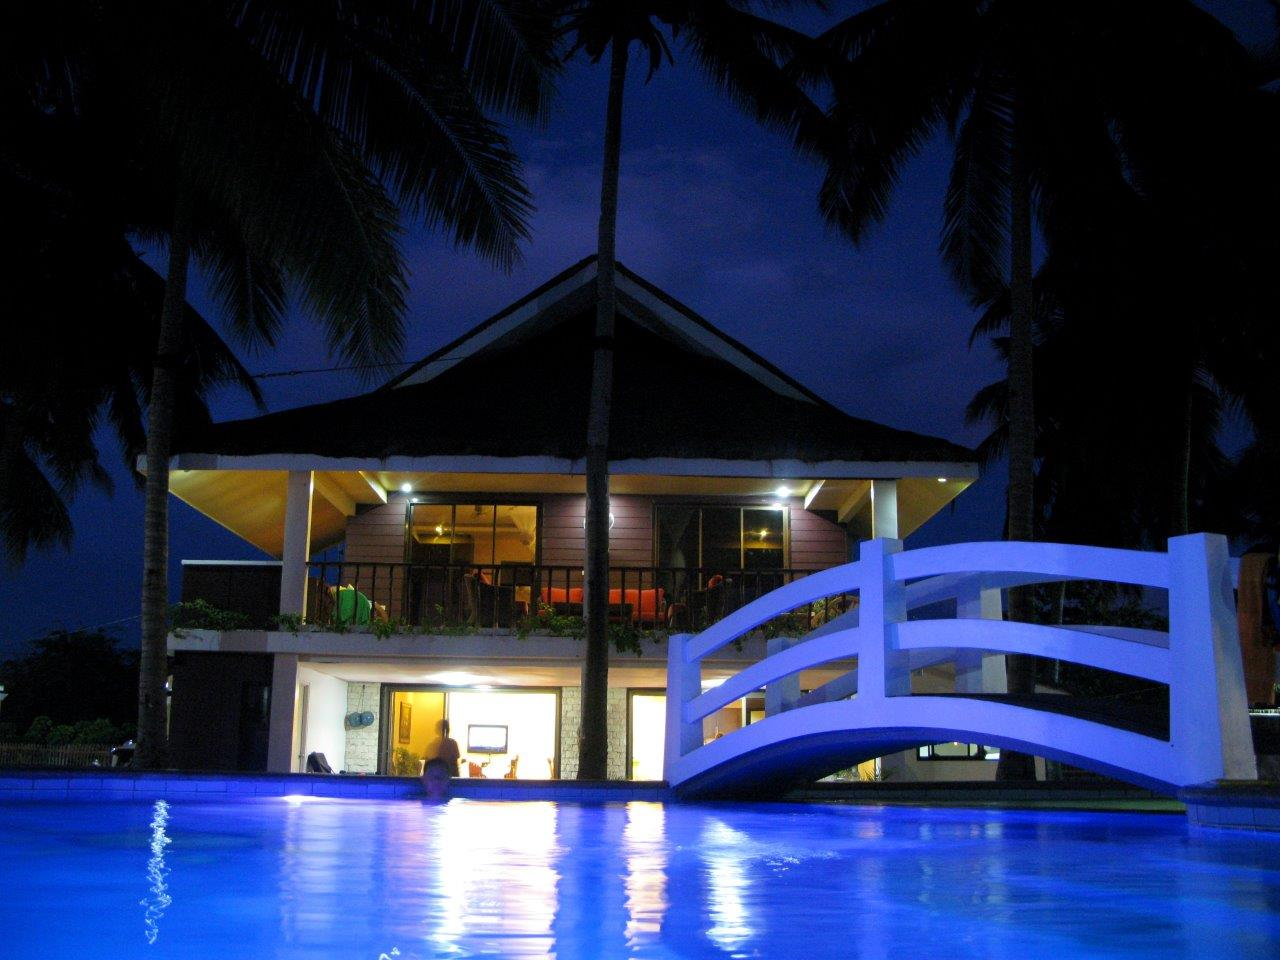 almalin beach resort isla verde